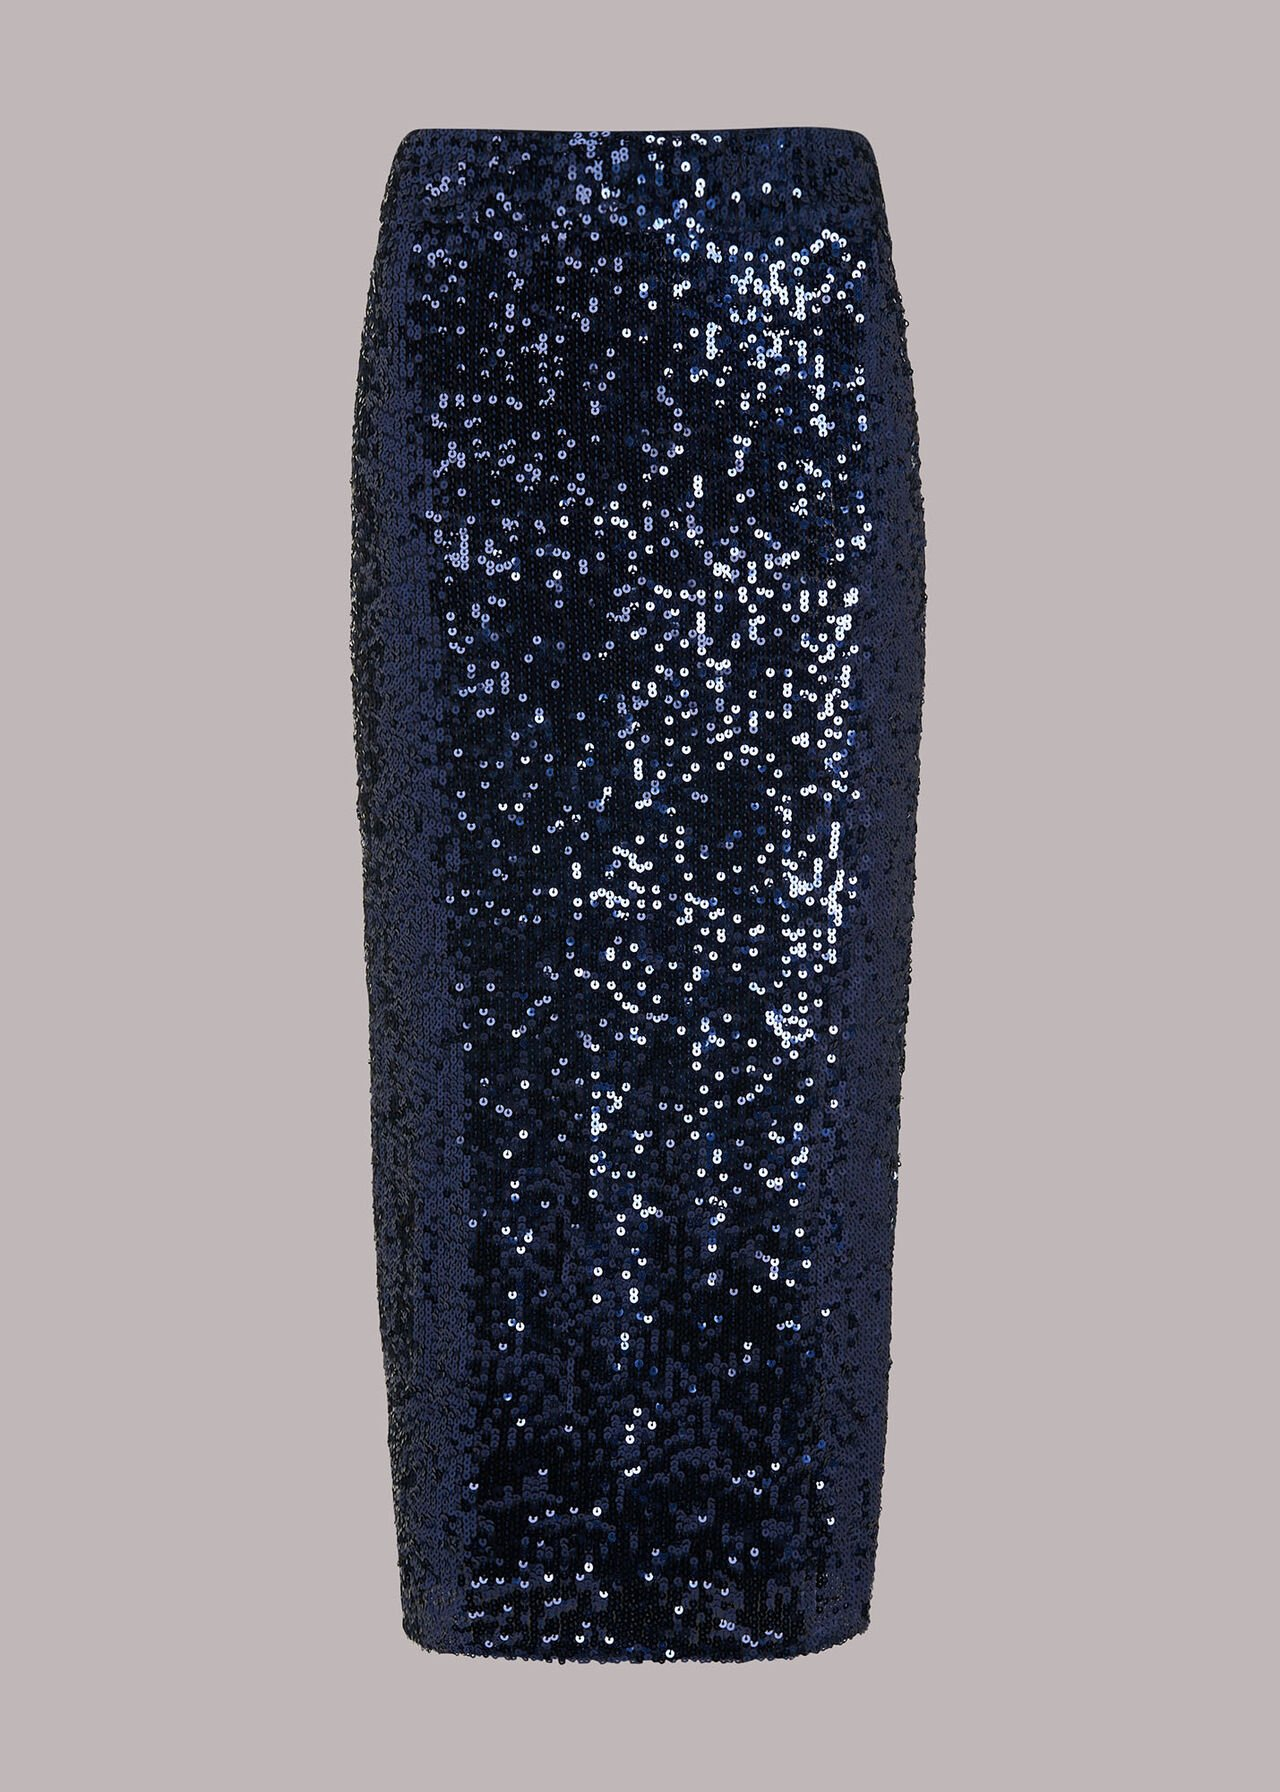 Sequin Column Skirt